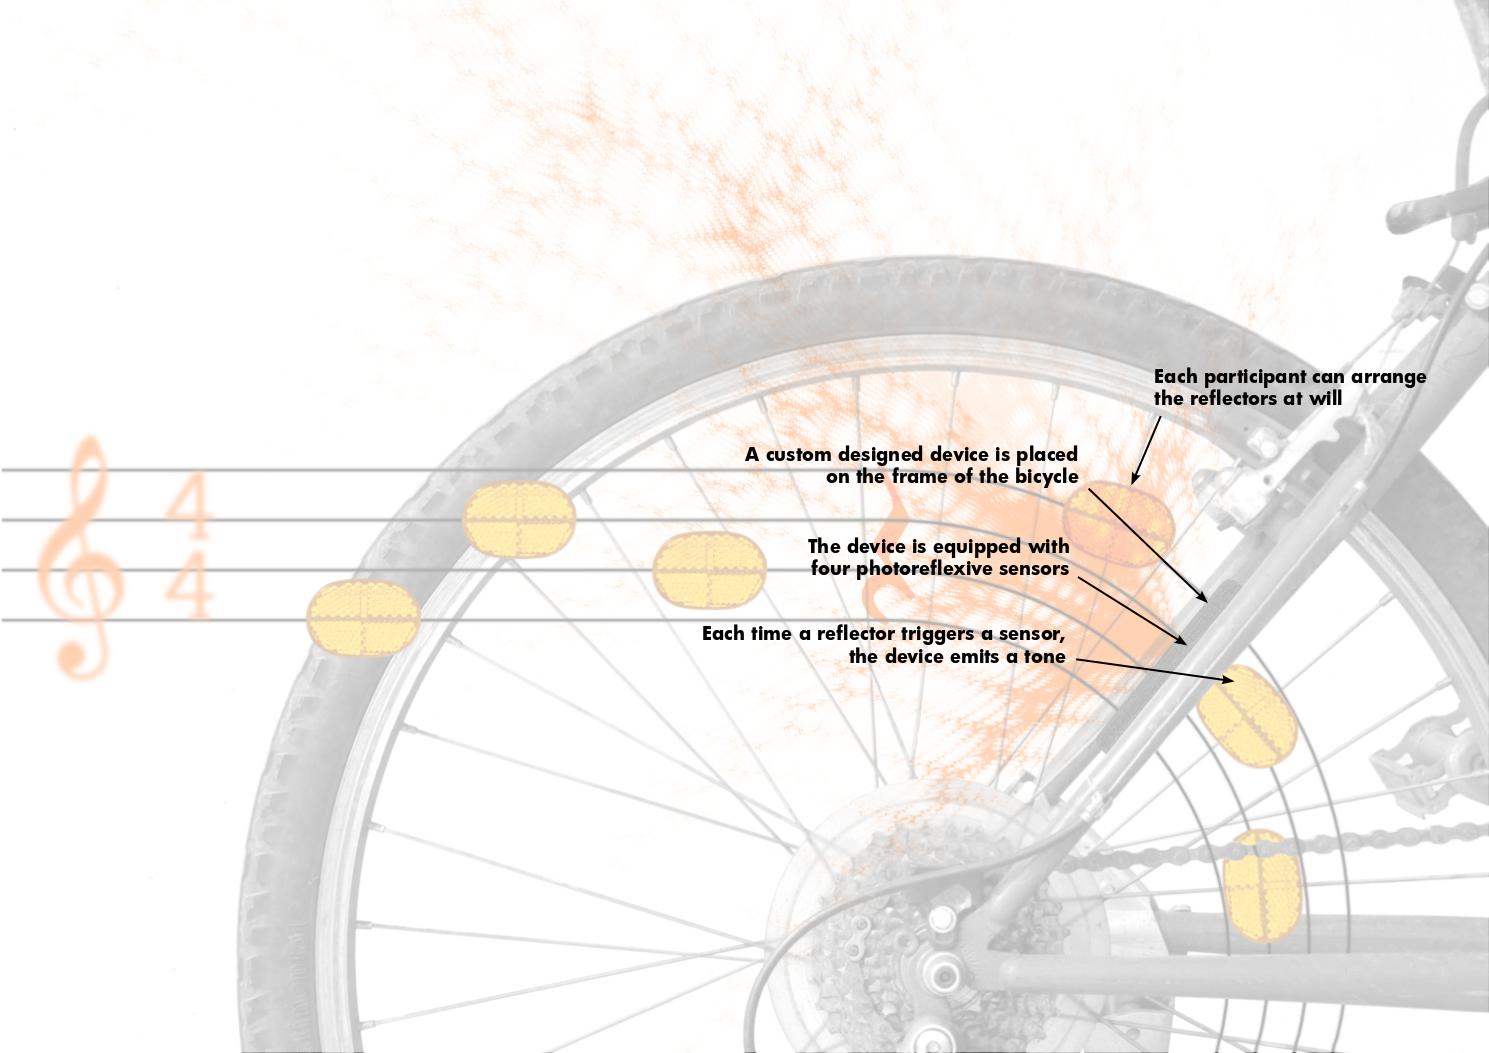 Pedalando ma non troppo - Graphical explanation explanation of the project